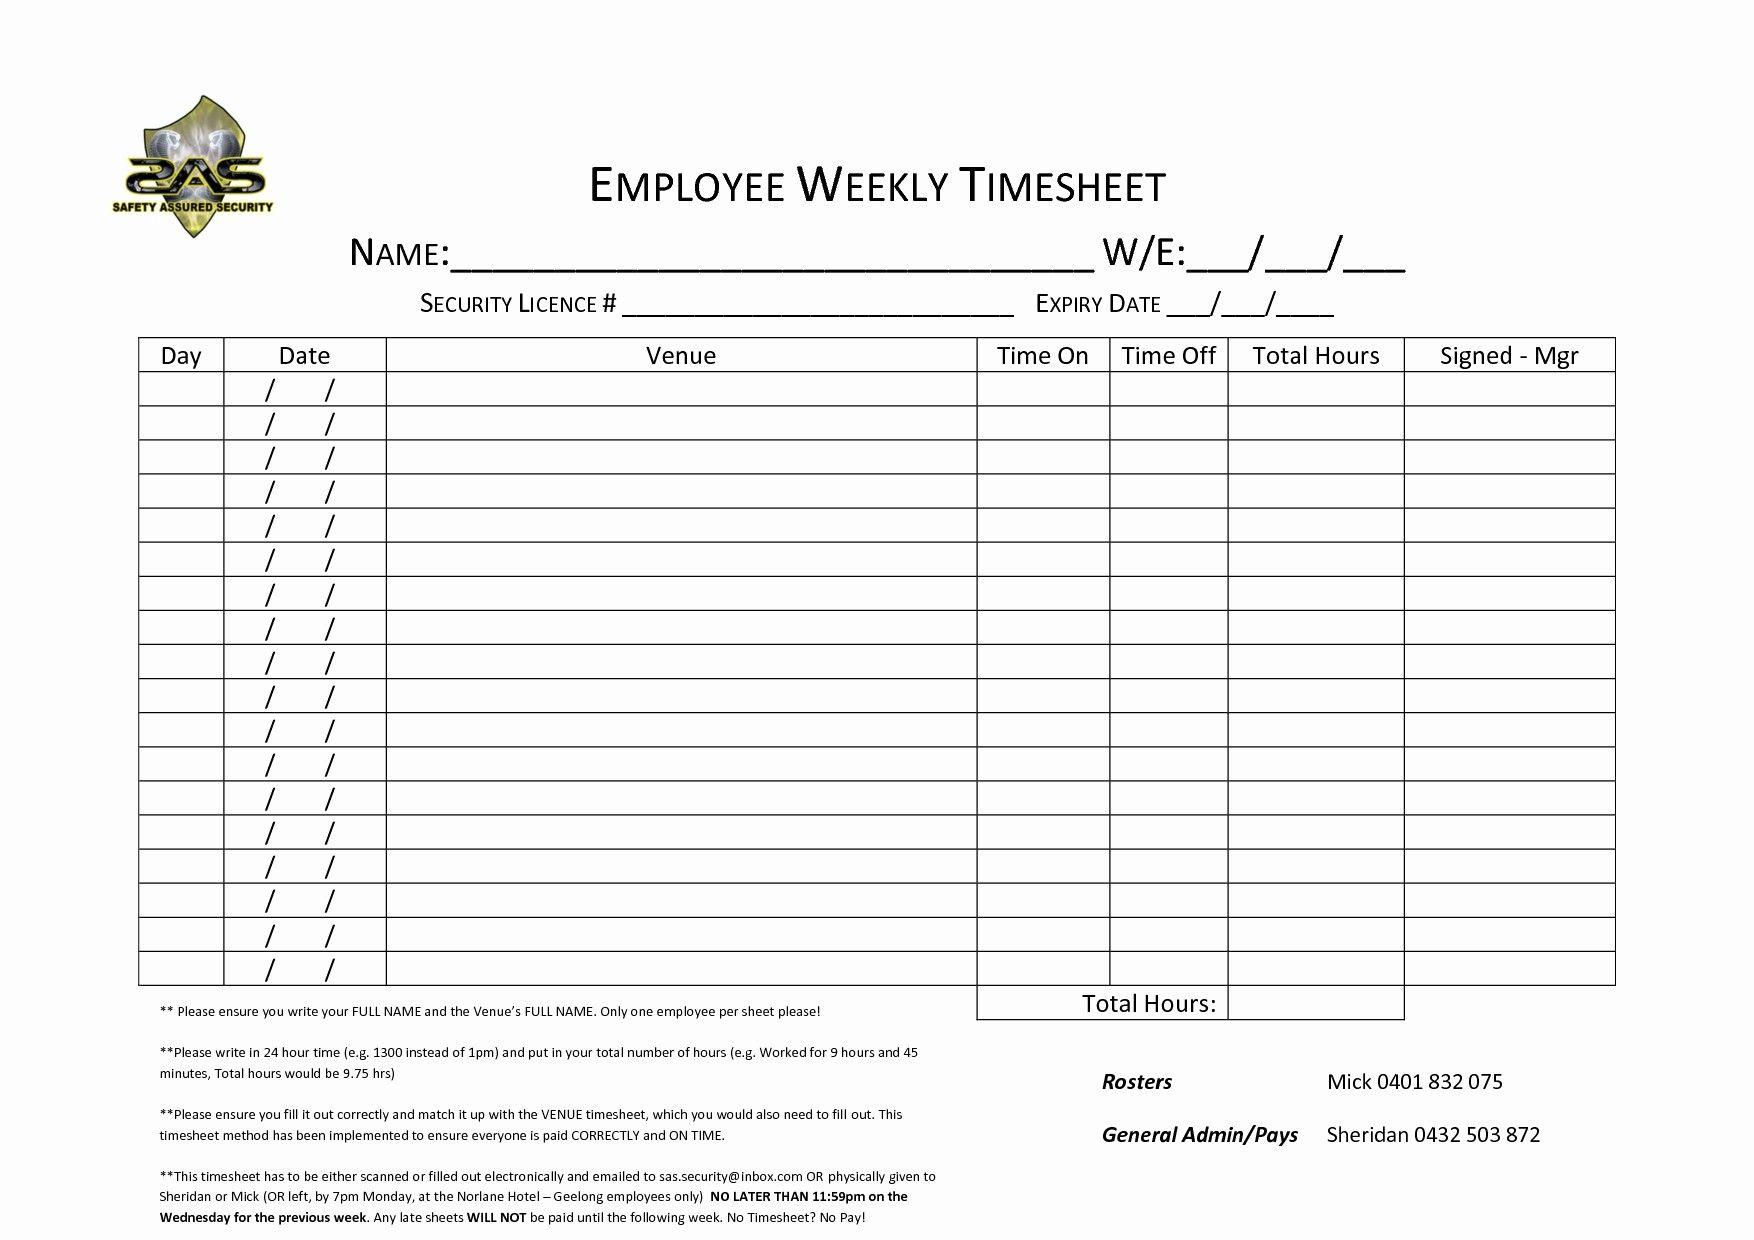 New Multiple Employee Timesheet Template Exceltemplate Xls Xlstemplate Xlsformat Excelformat Microsoftexcel Timesheet Template Templates Excel Templates